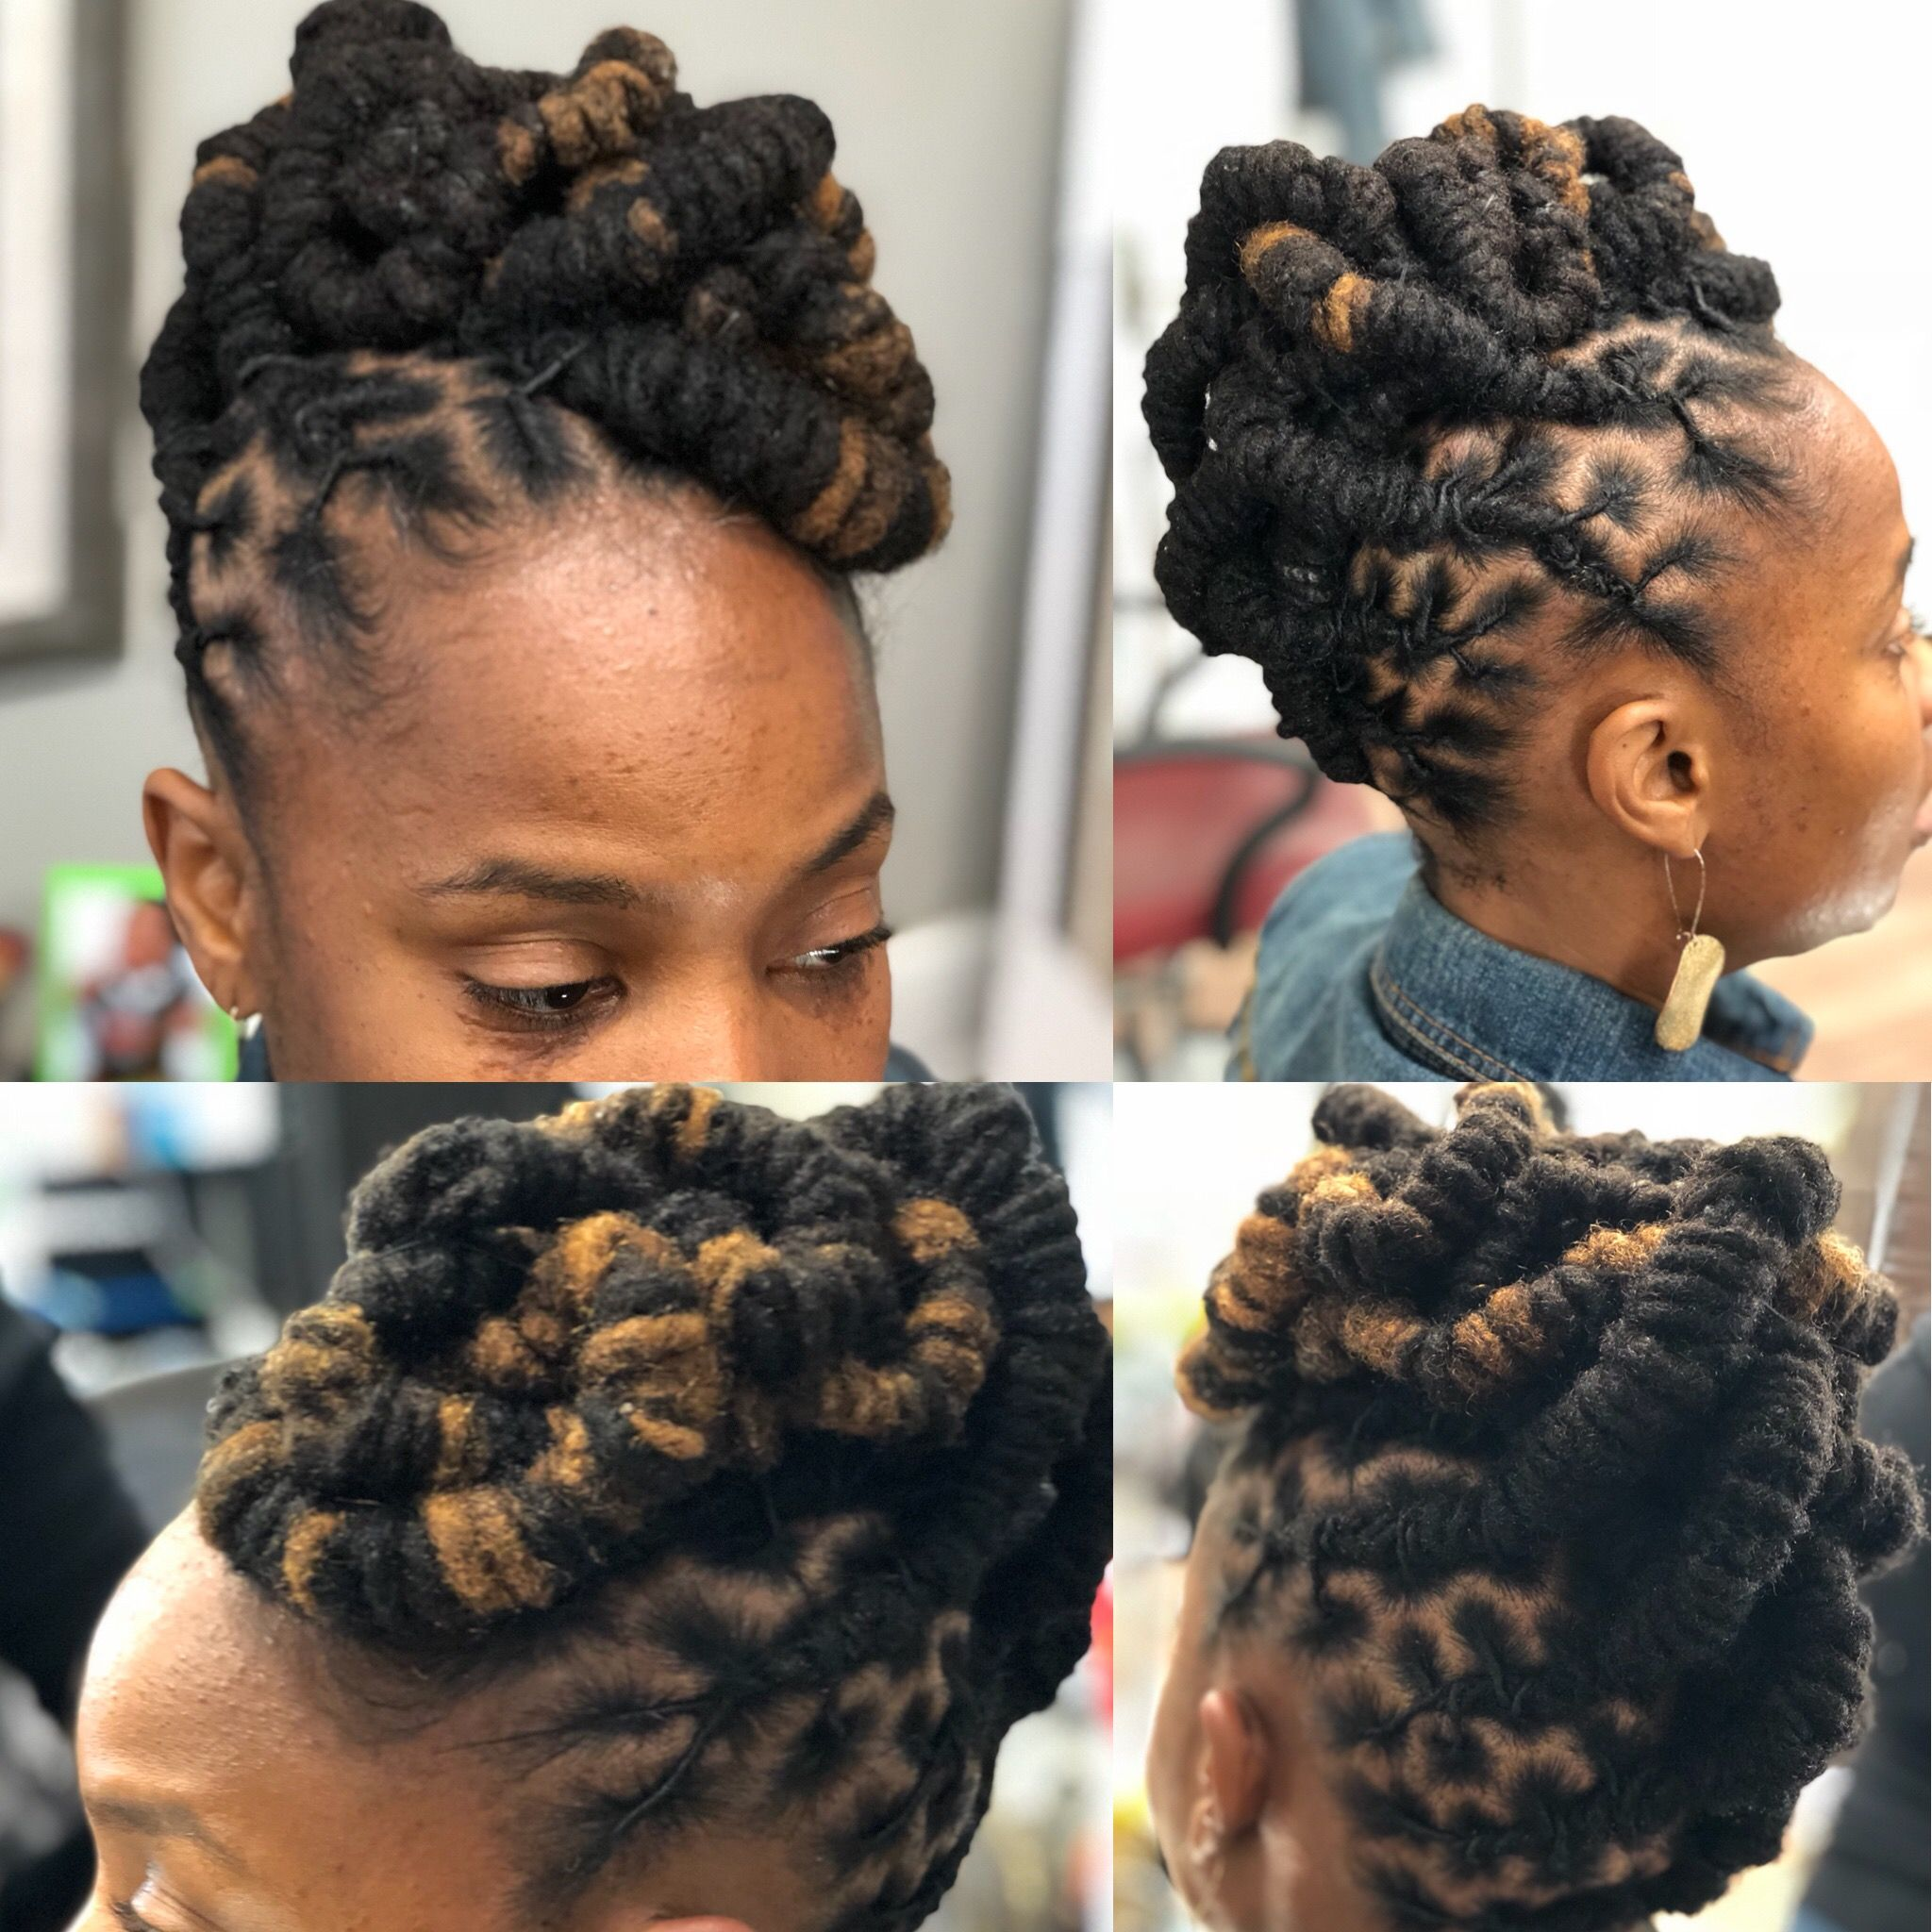 2019 Best Dreadlocks Styles Wylocks Dreadskenya Womenwithlocs Dreadlock Hairstyles Black Locs Hairstyles Dreadlock Hairstyles